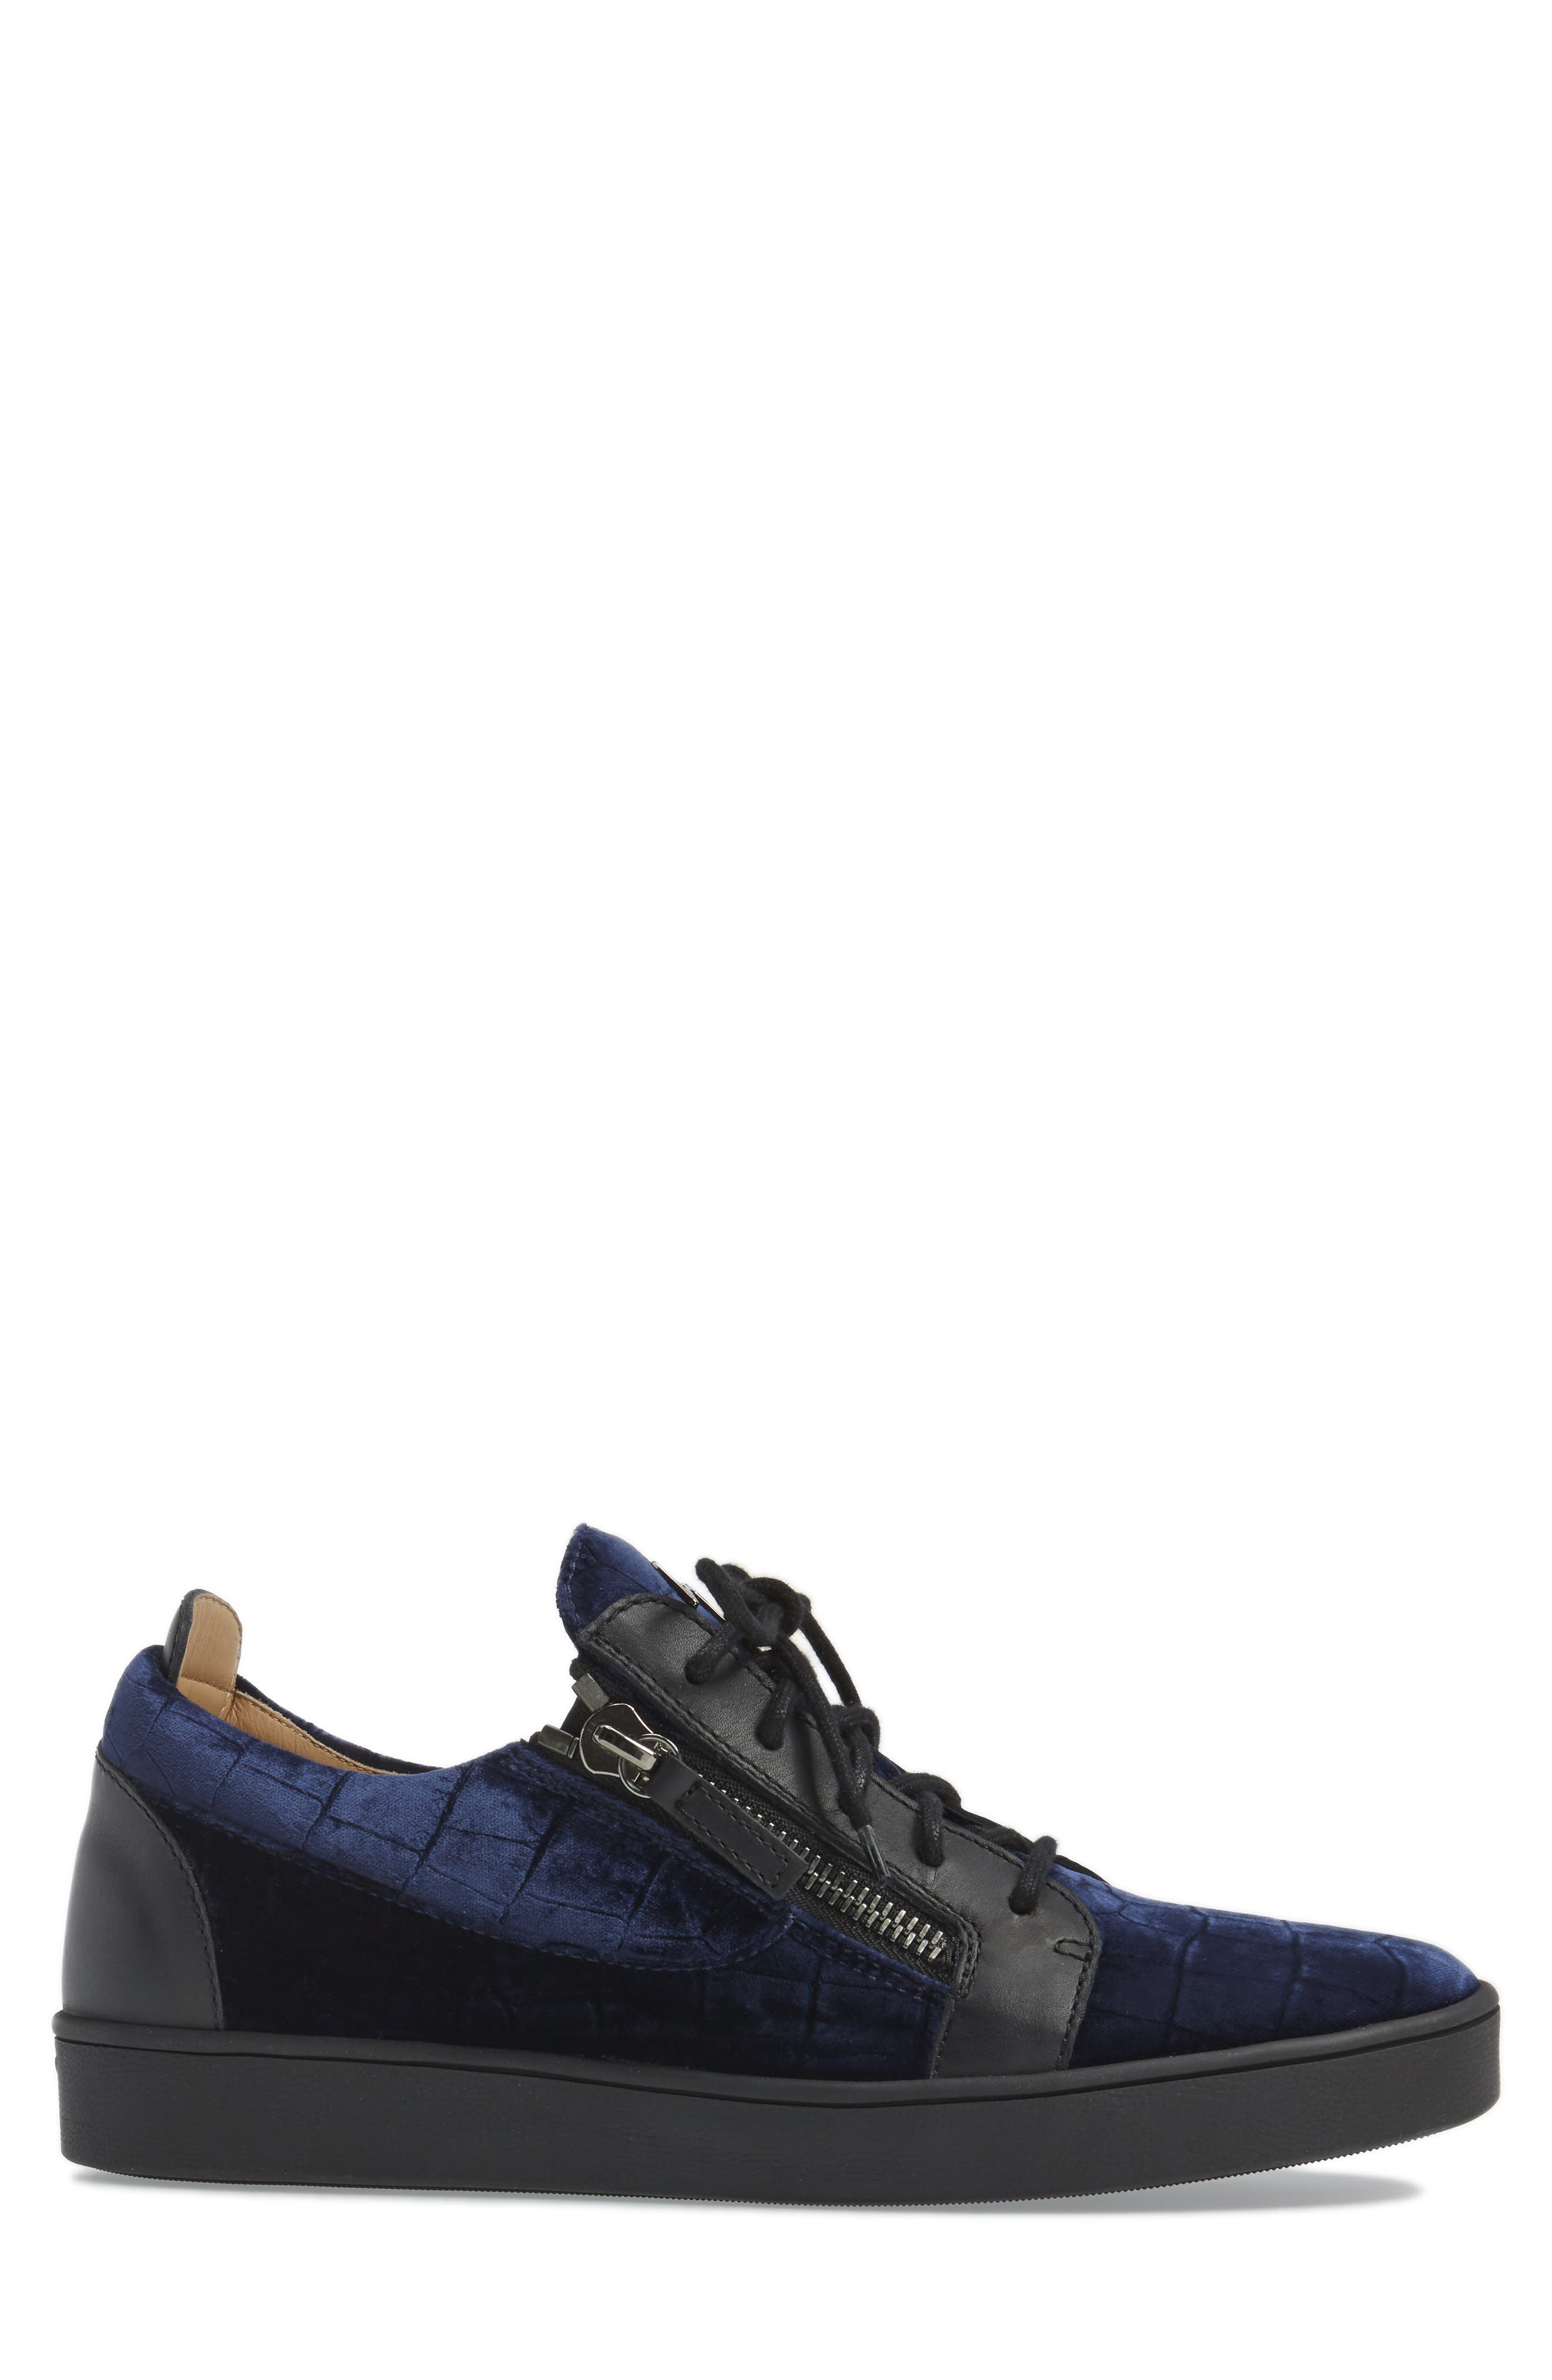 Low Top Sneaker,                             Alternate thumbnail 3, color,                             Navy